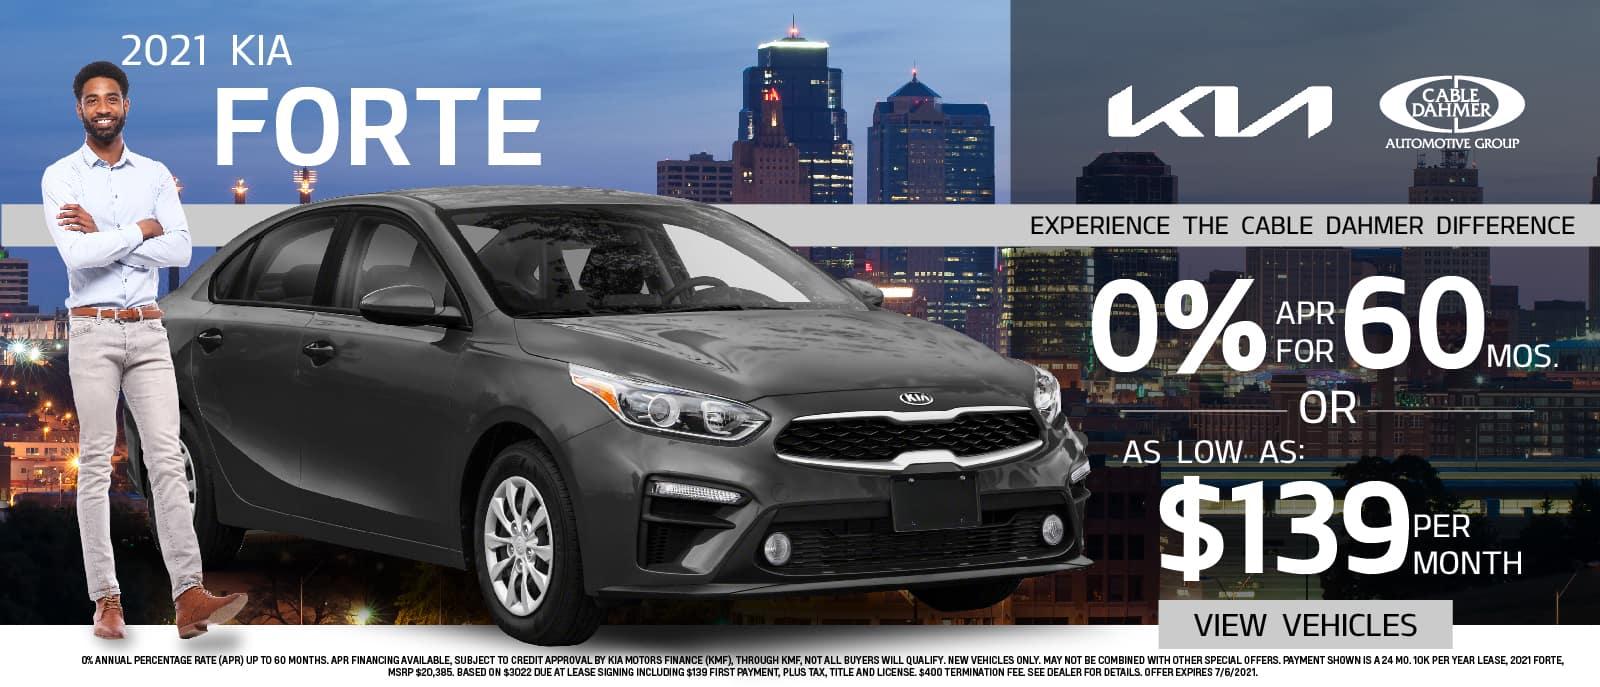 2021 Kia Forte – June Promotion